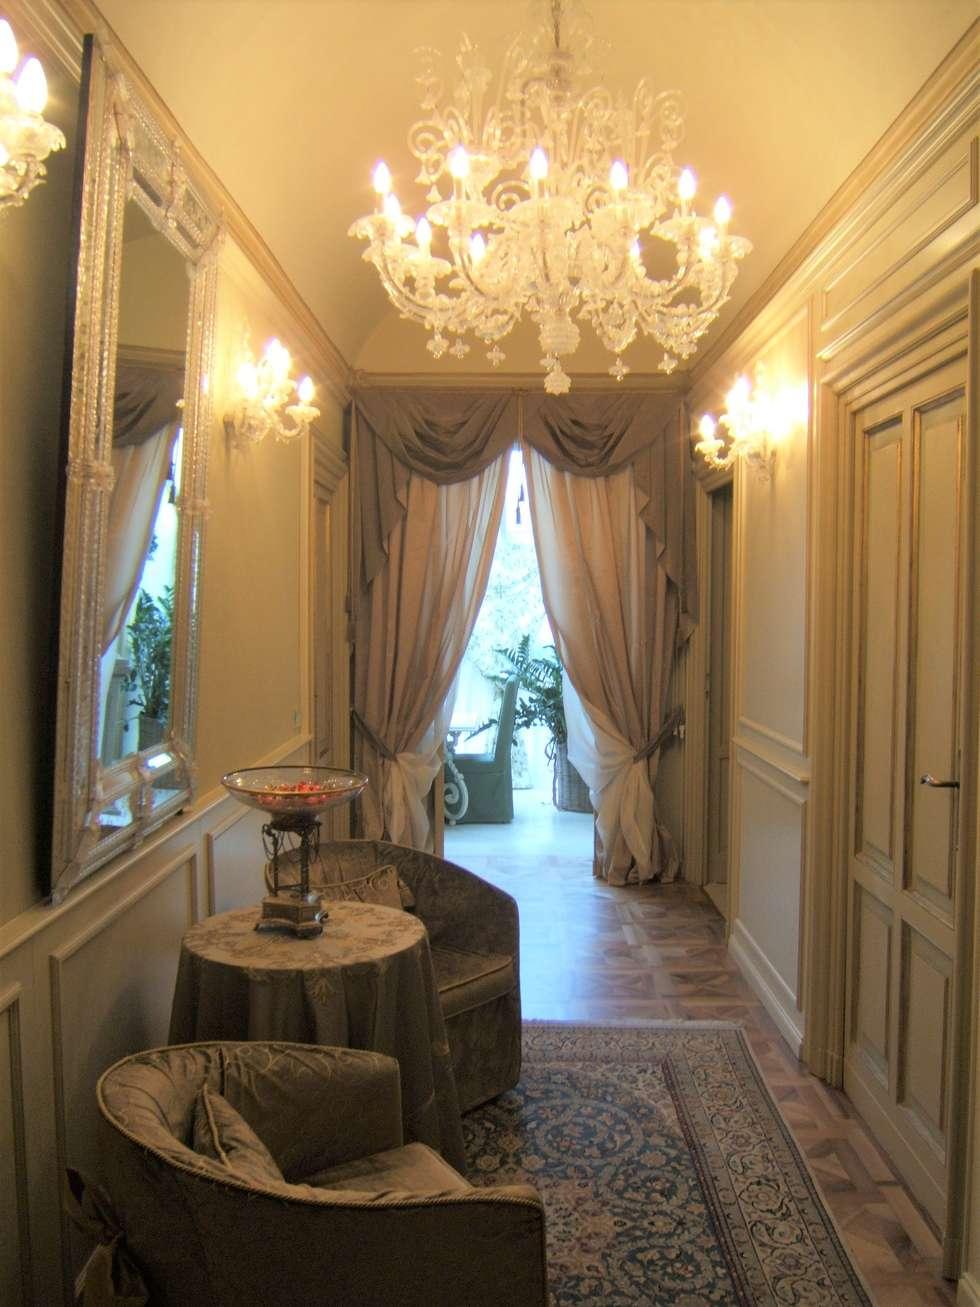 GALLERY: Ingresso & Corridoio in stile  di Emanuela Volpicelli Interior Designer